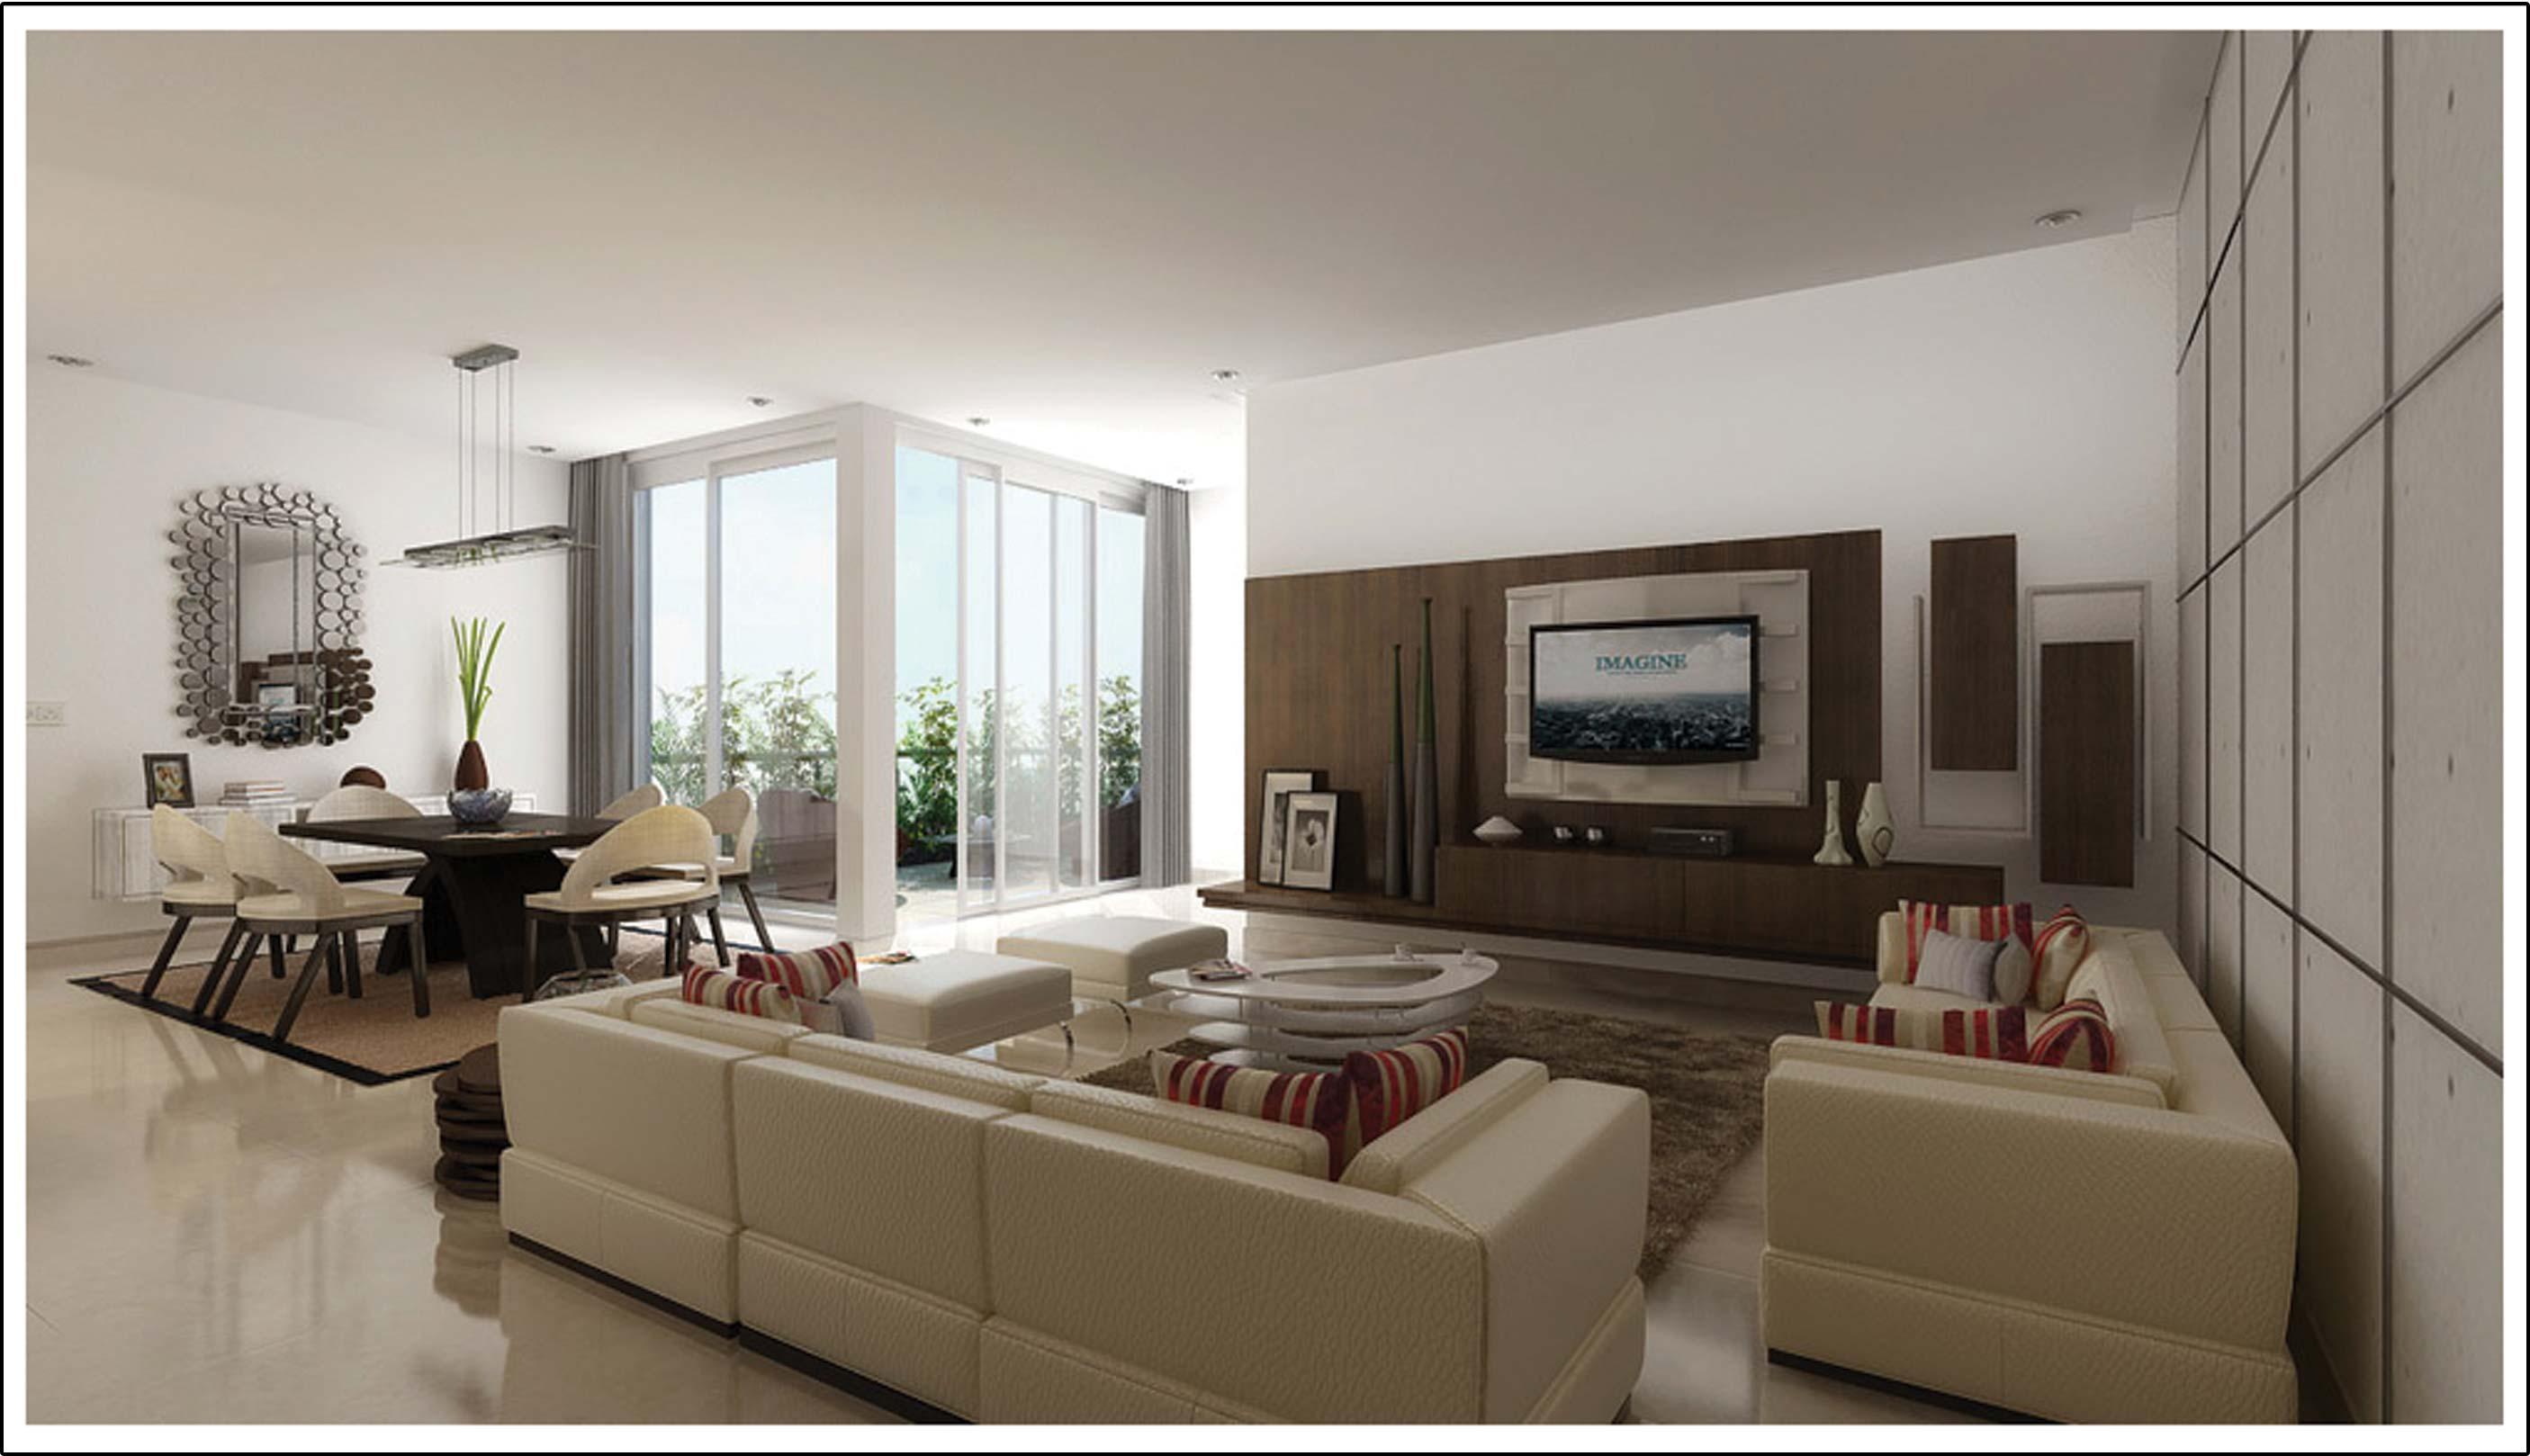 Interior Design Residinaital and Commercial | Freelancers 3D